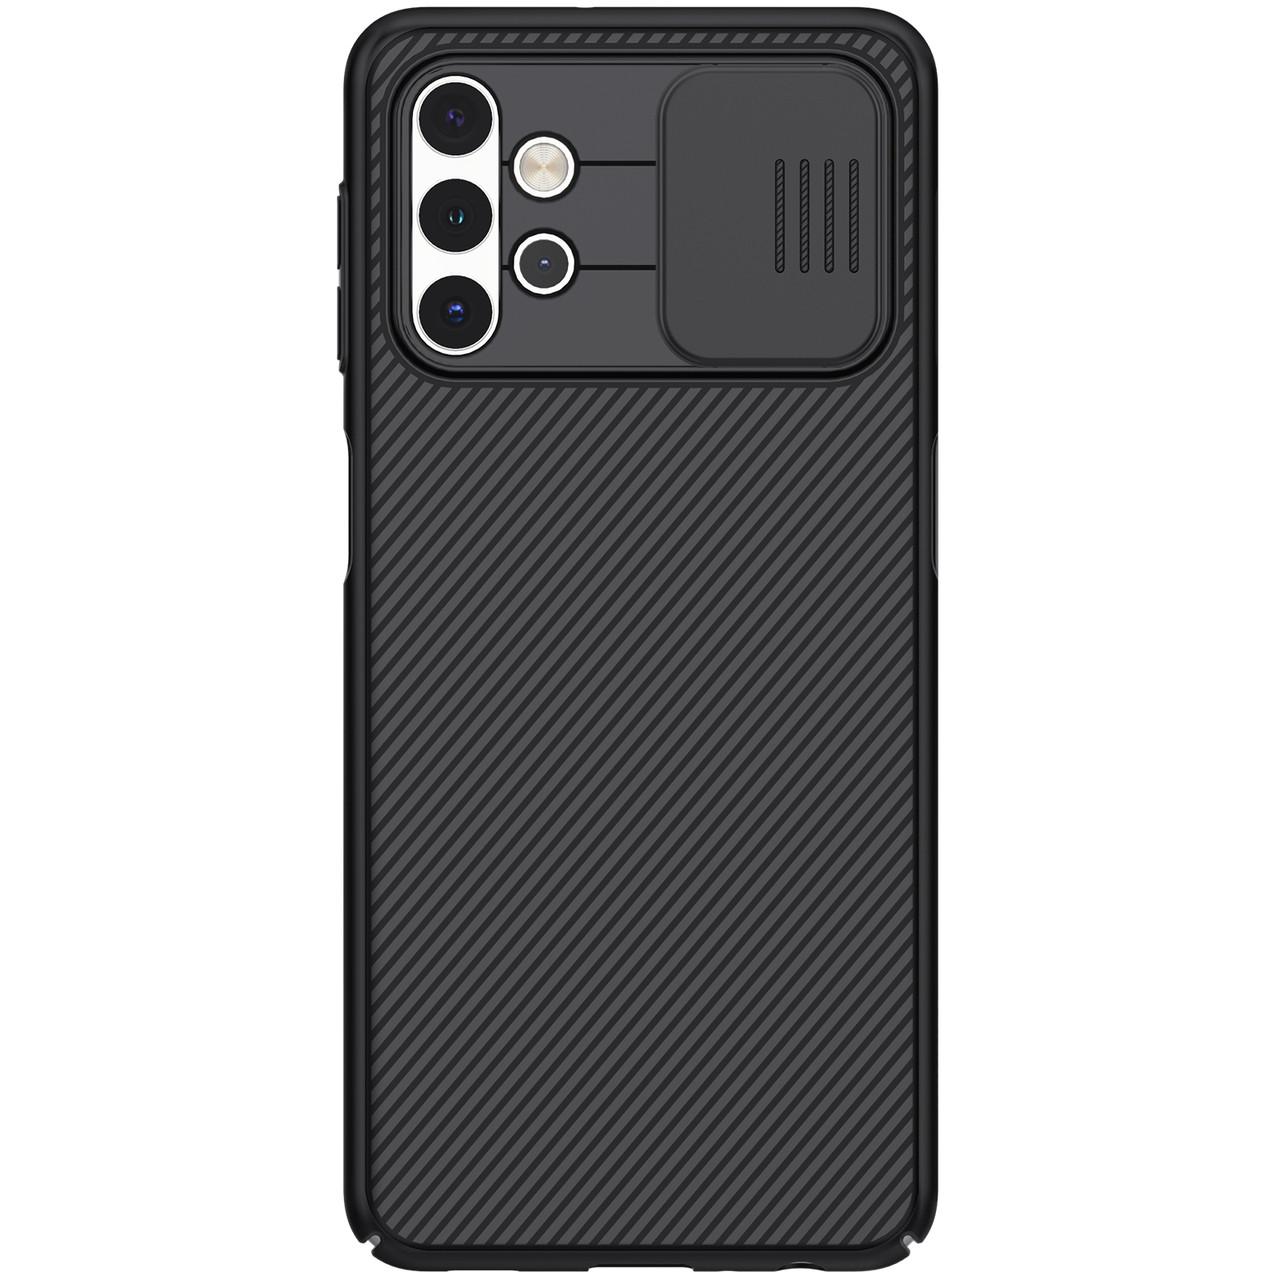 Захисний чохол Nillkin для Samsung Galaxy A32 5G (CamShield Case) з захистом камери